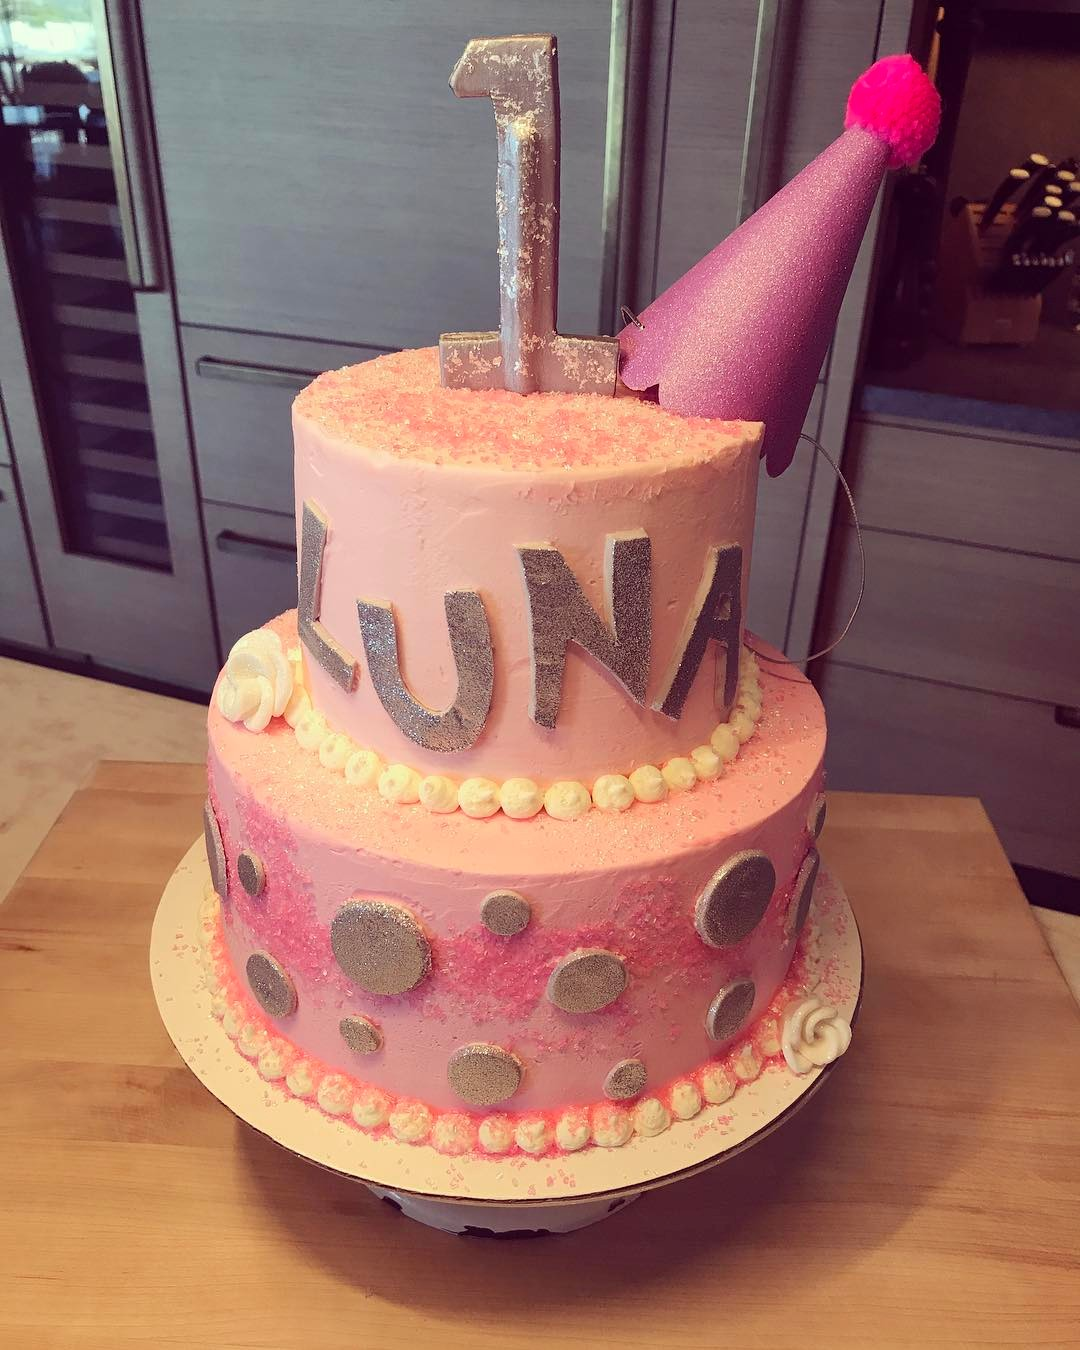 Chrissy Teigen And John Legend's Daughter Luna Enjoyed Her Birthday As She Clocked 1 - 1